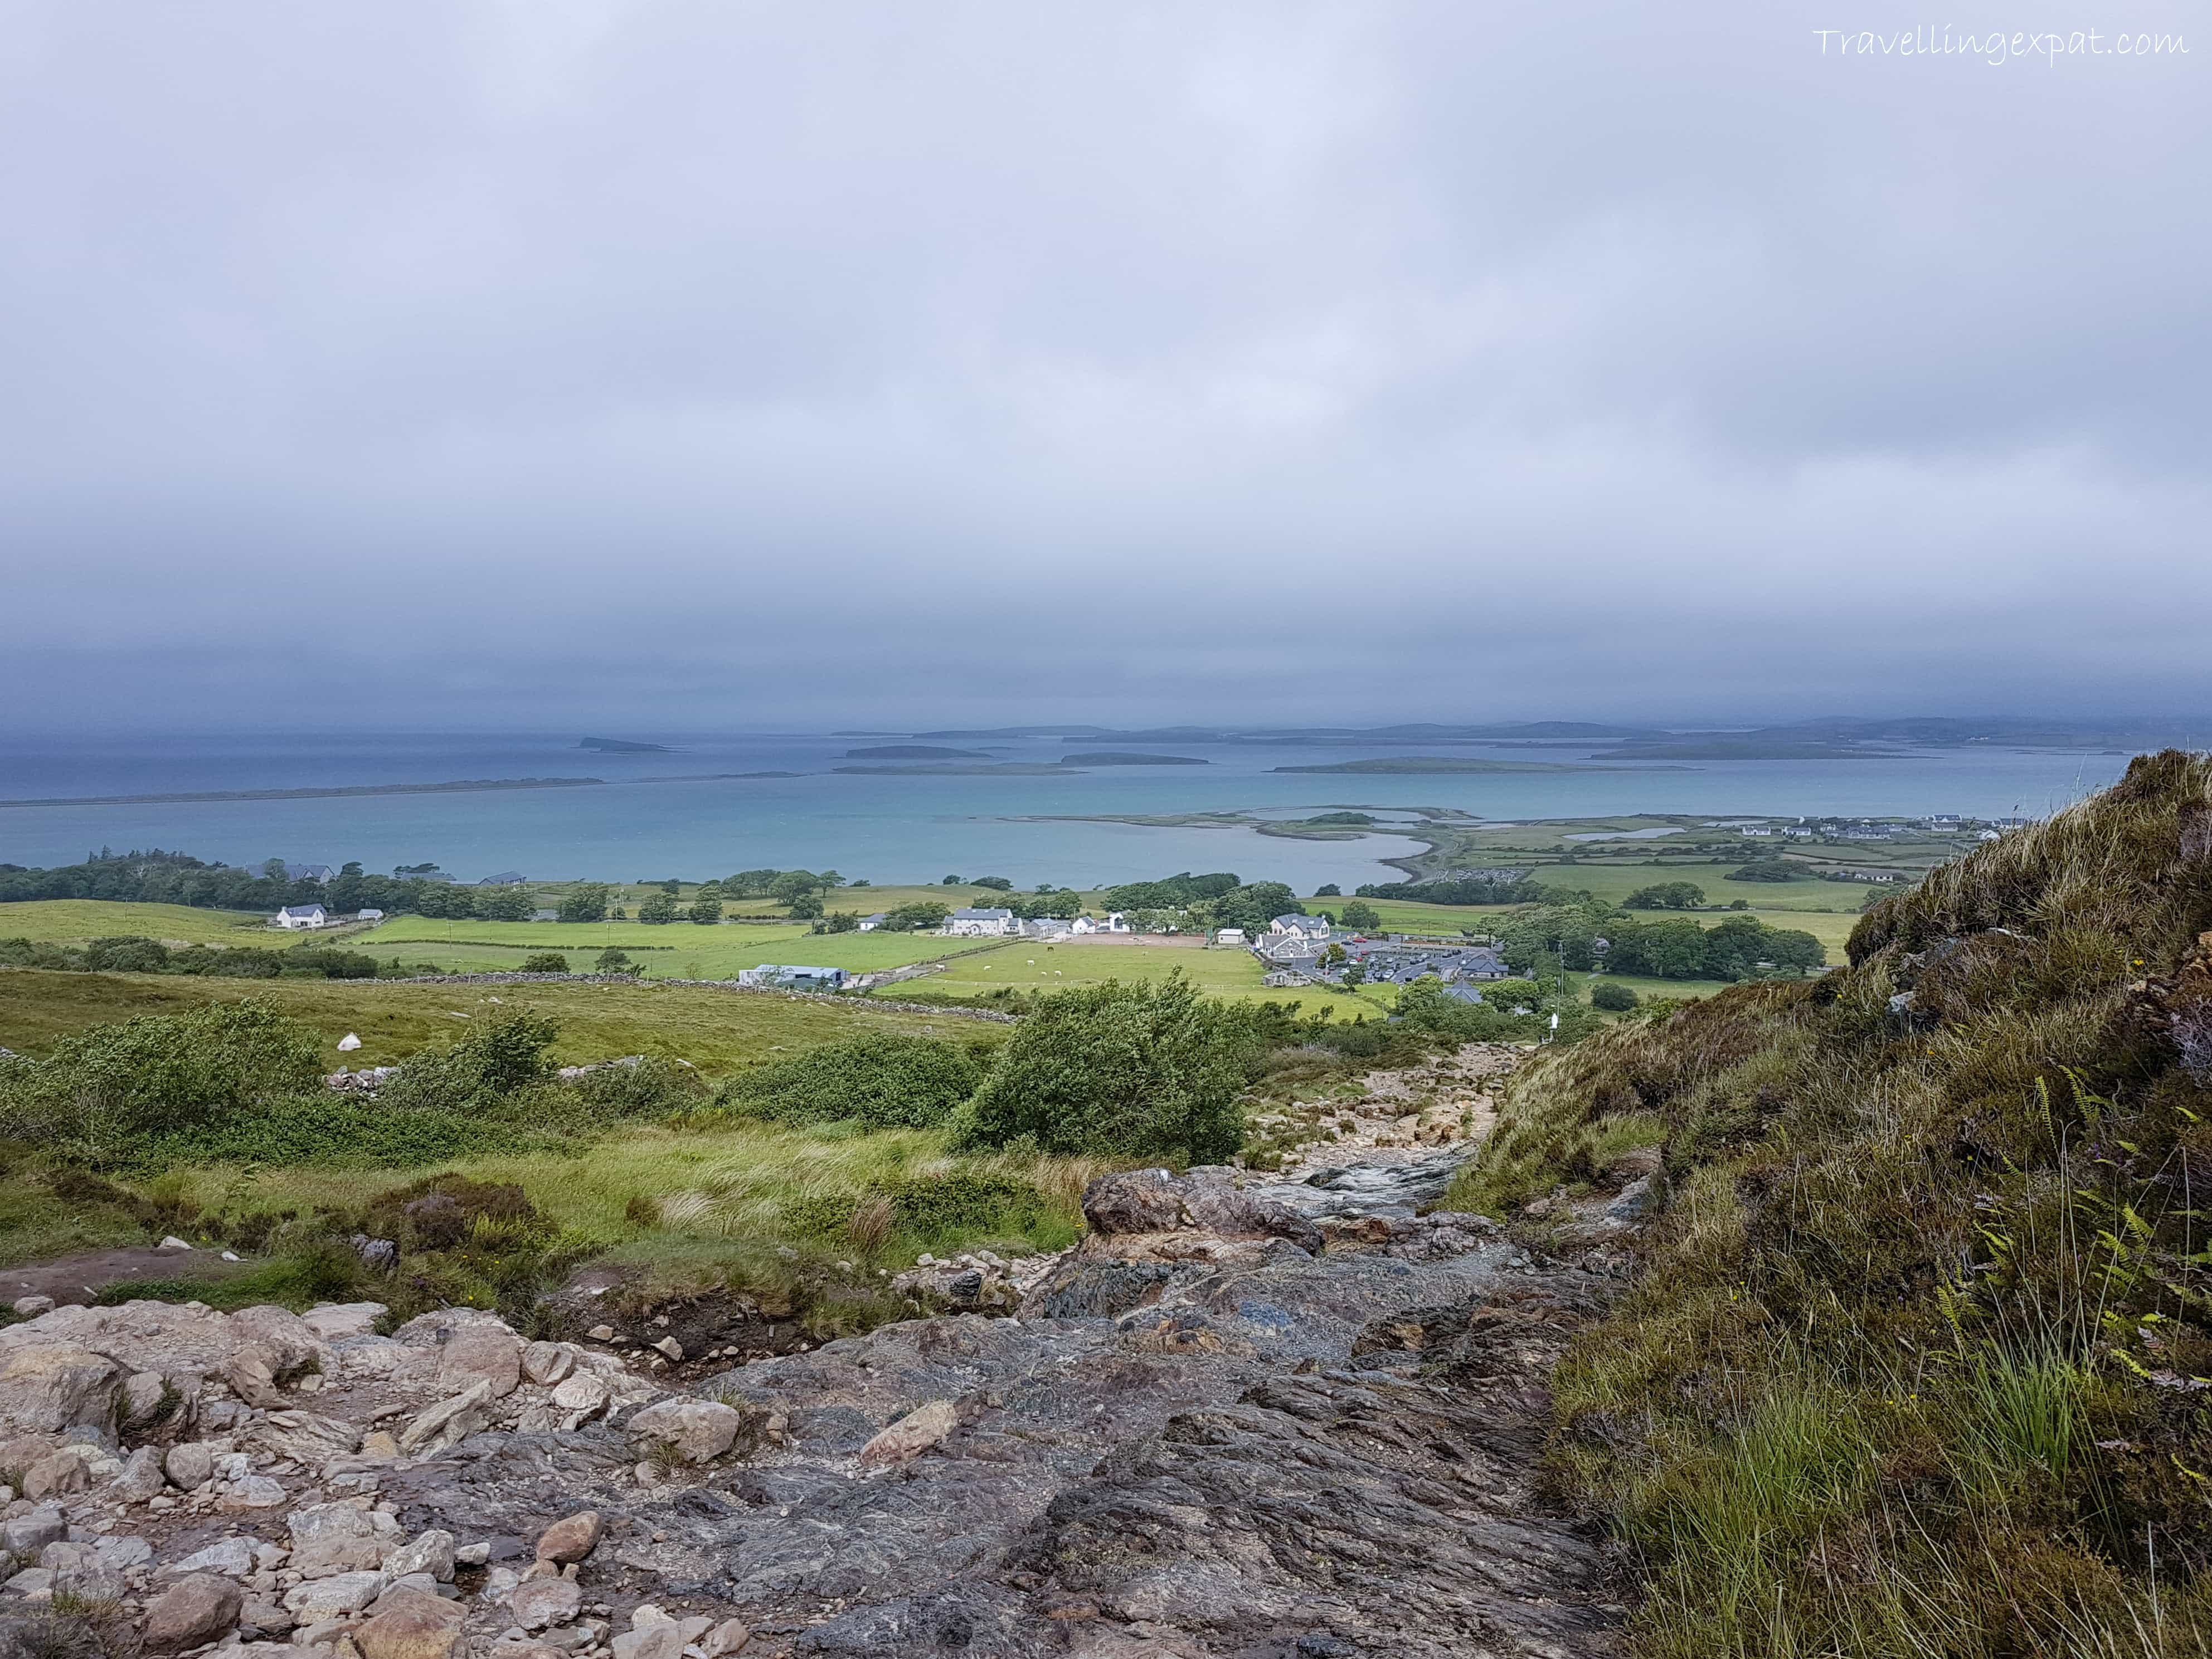 Camminare in Irlanda